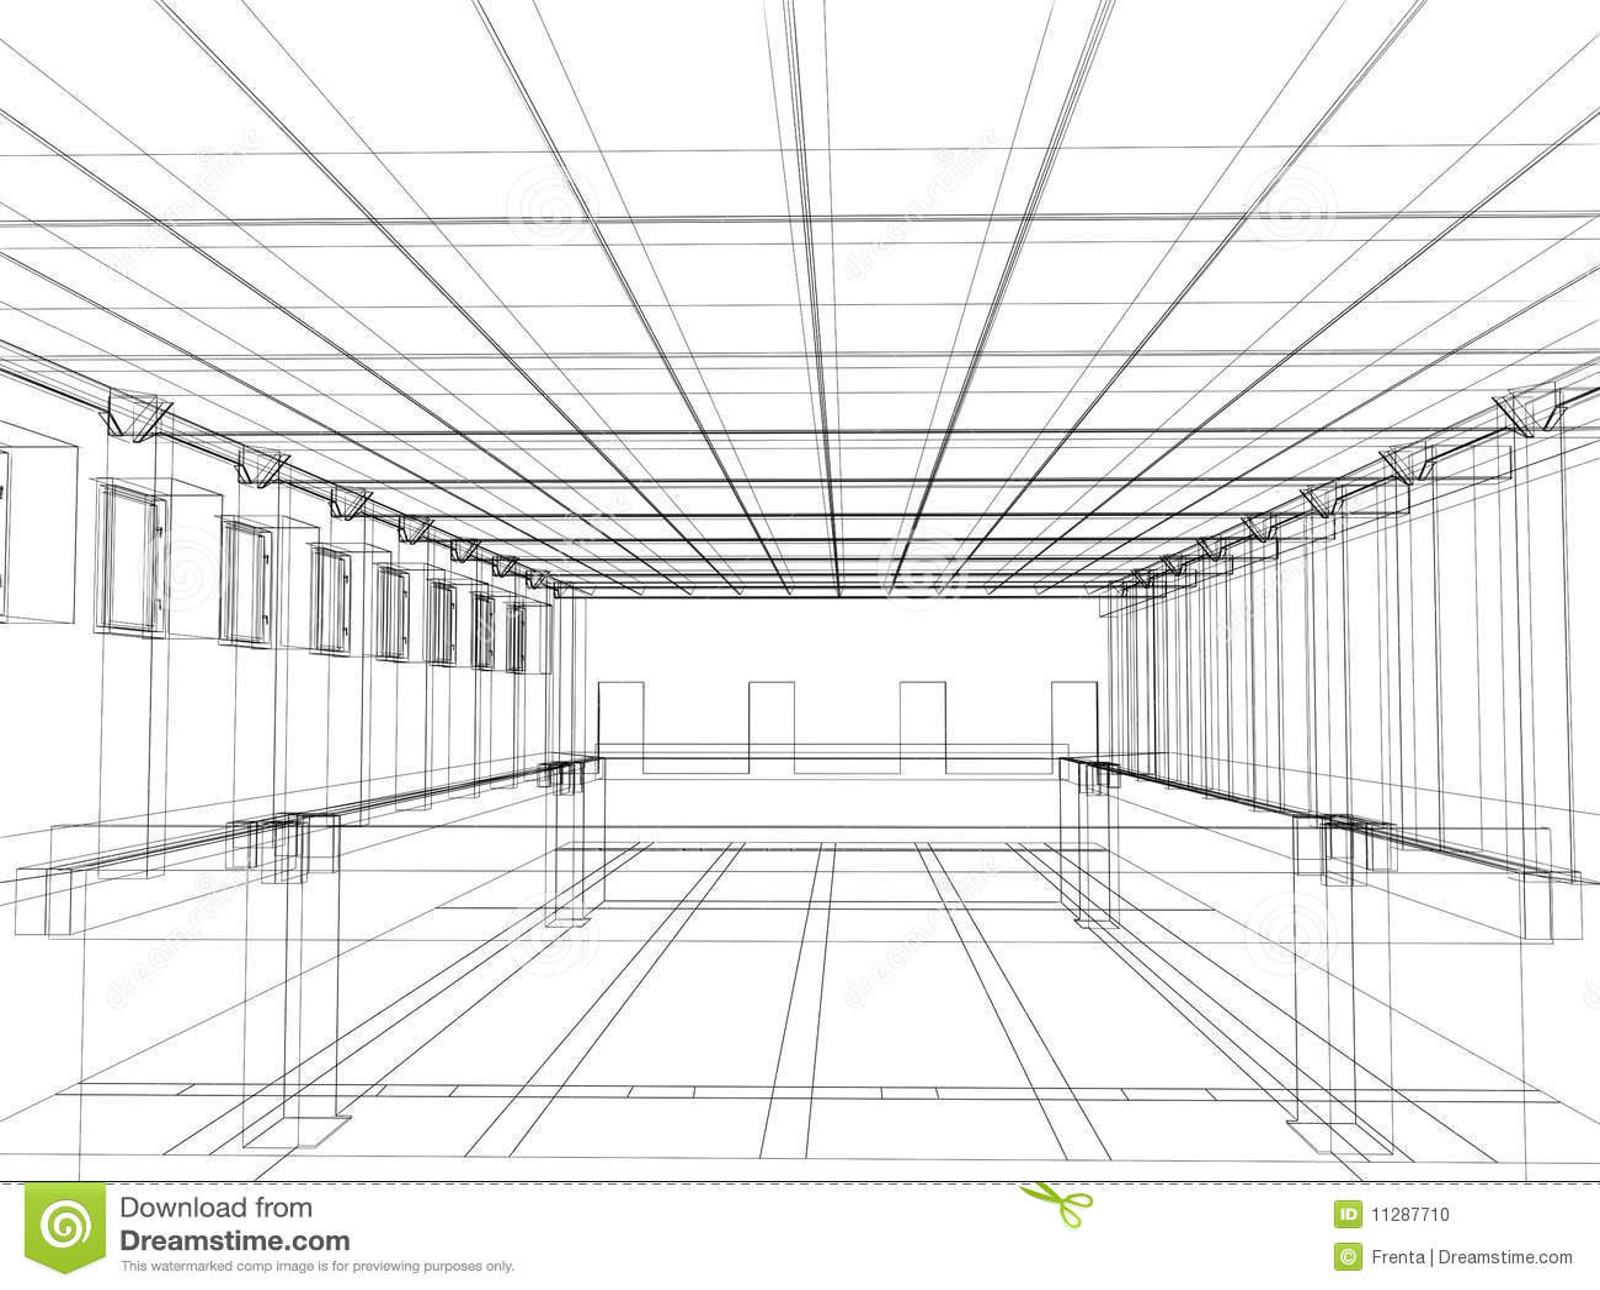 Перспектива для дизайна помещений